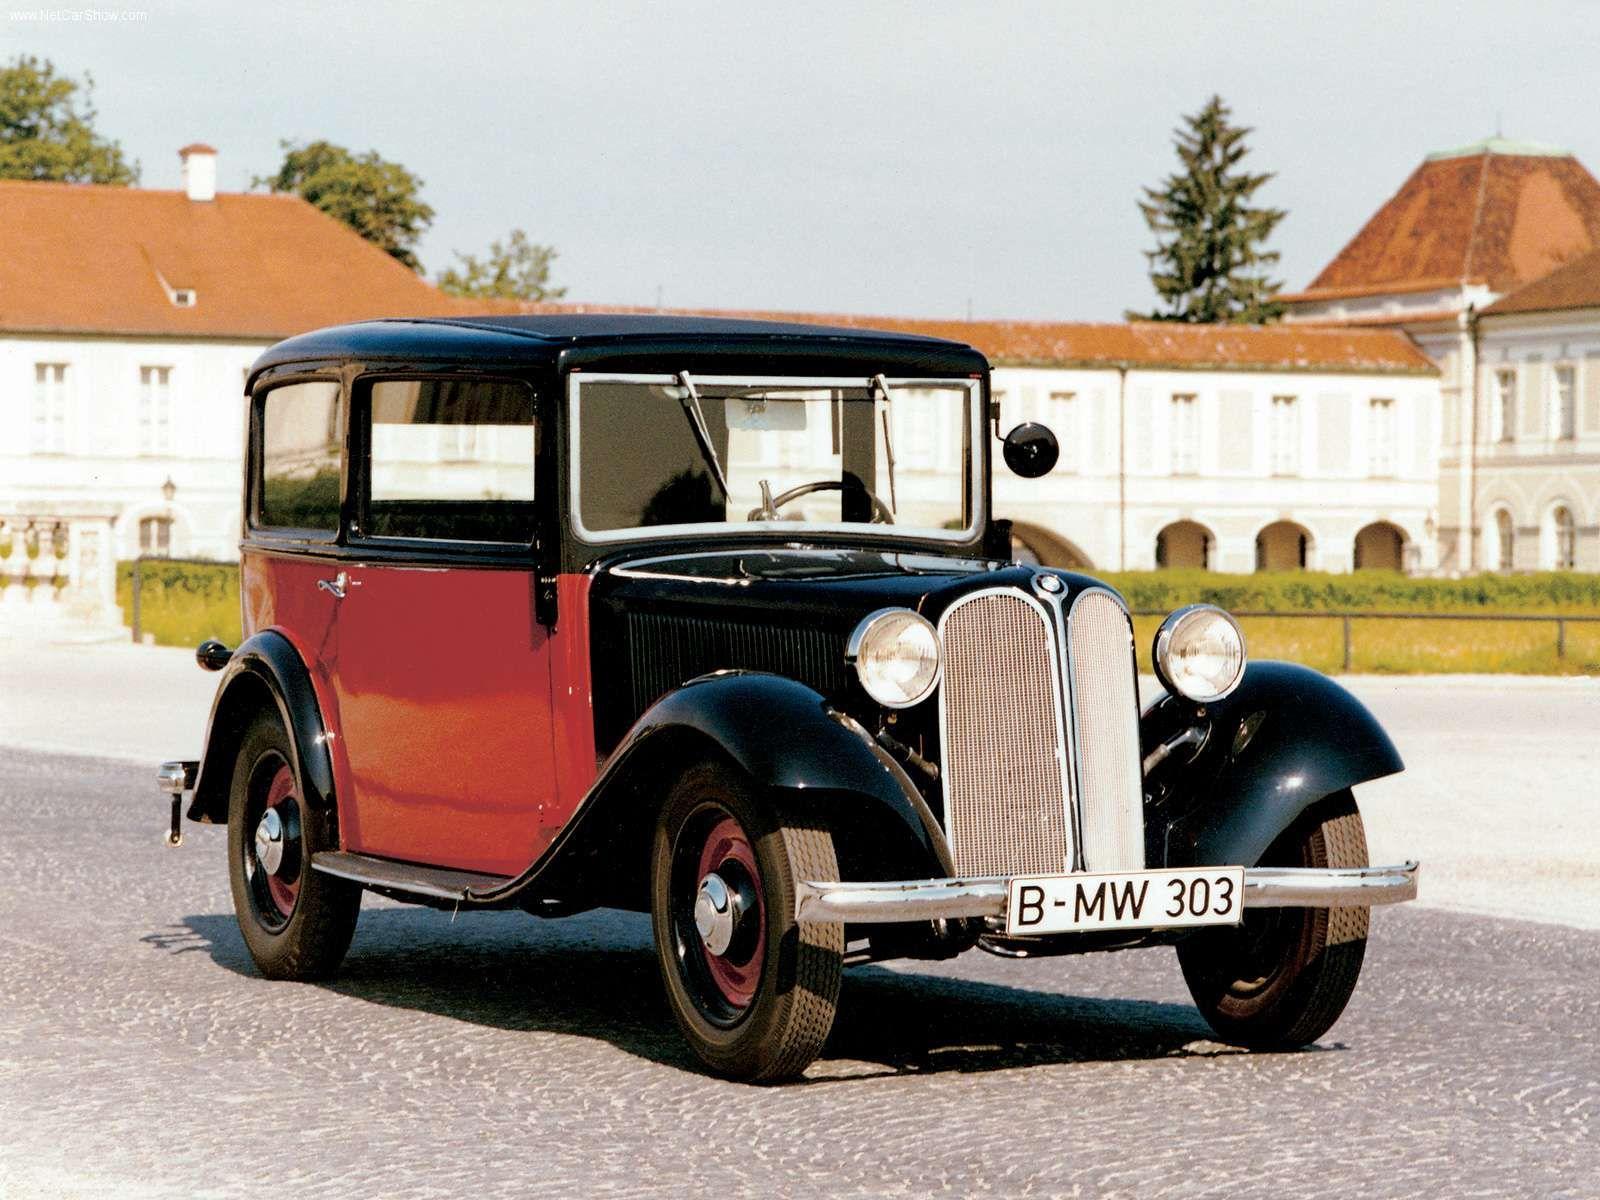 1933 BMW 303 Limousine - BMW pictures information & specs ...